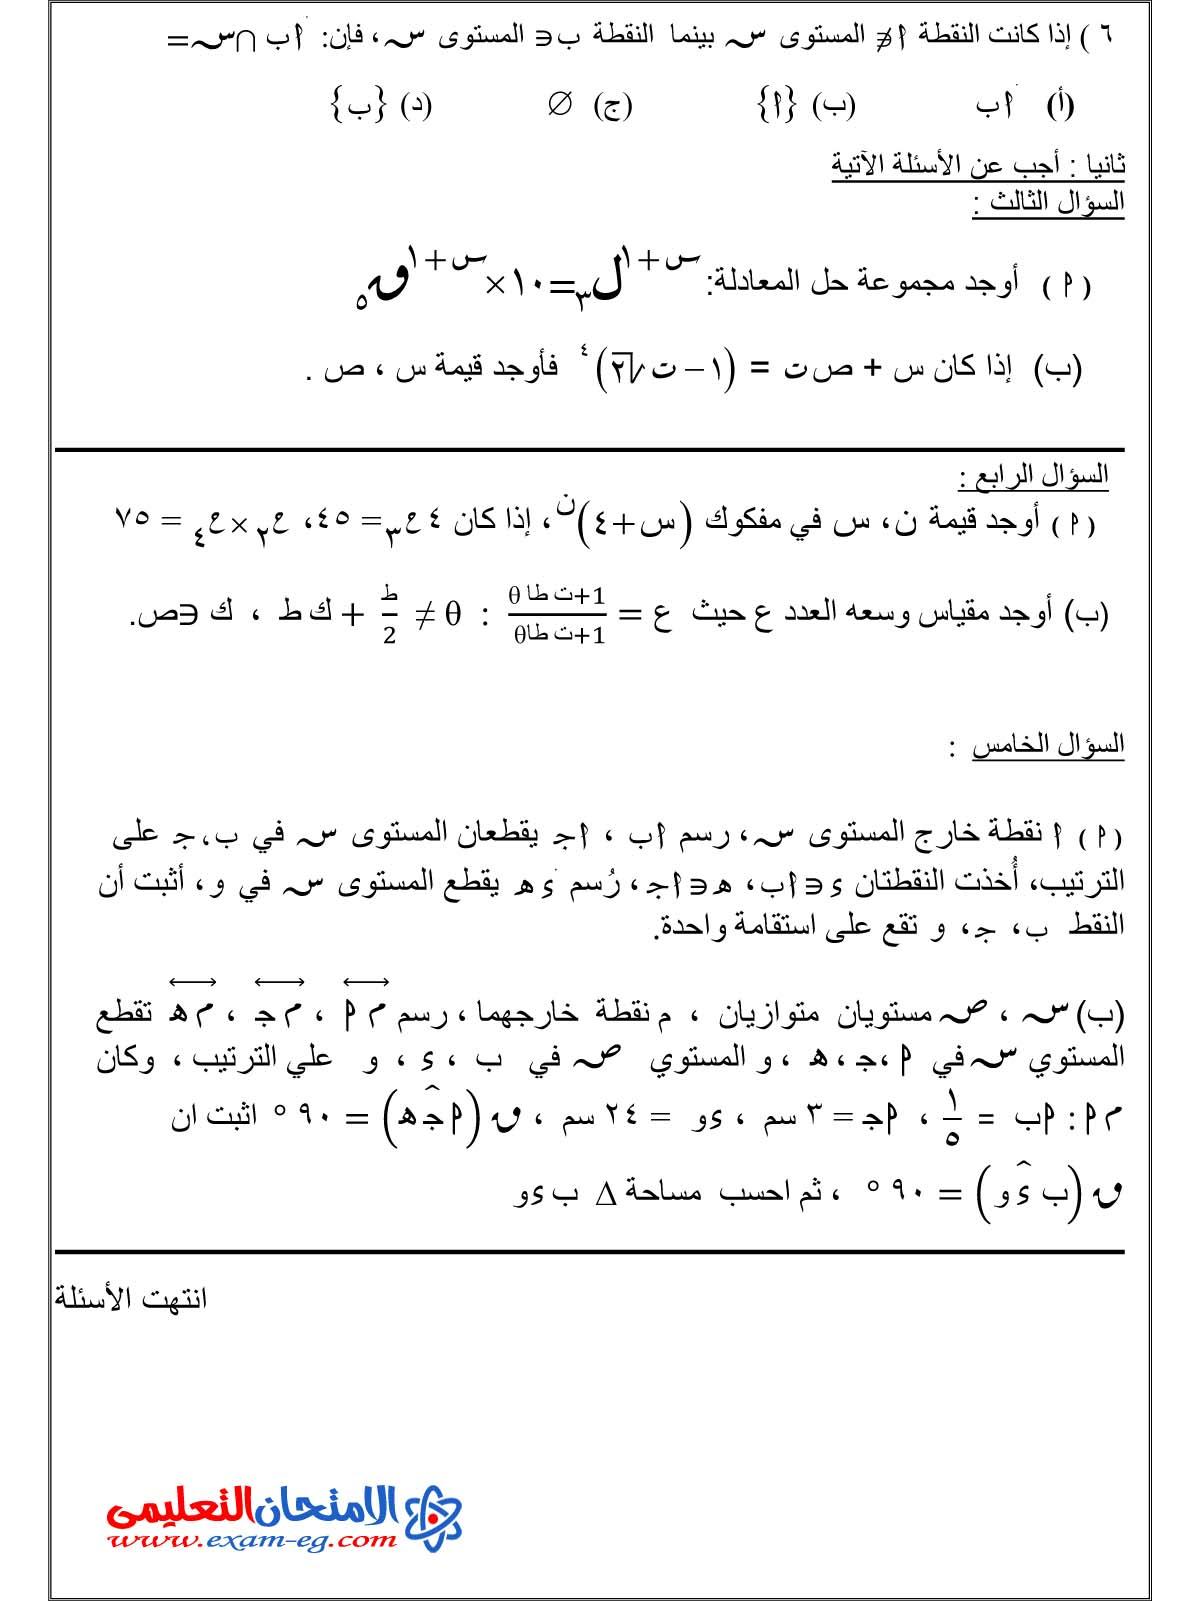 exam-eg.com_1460421183226.jpg